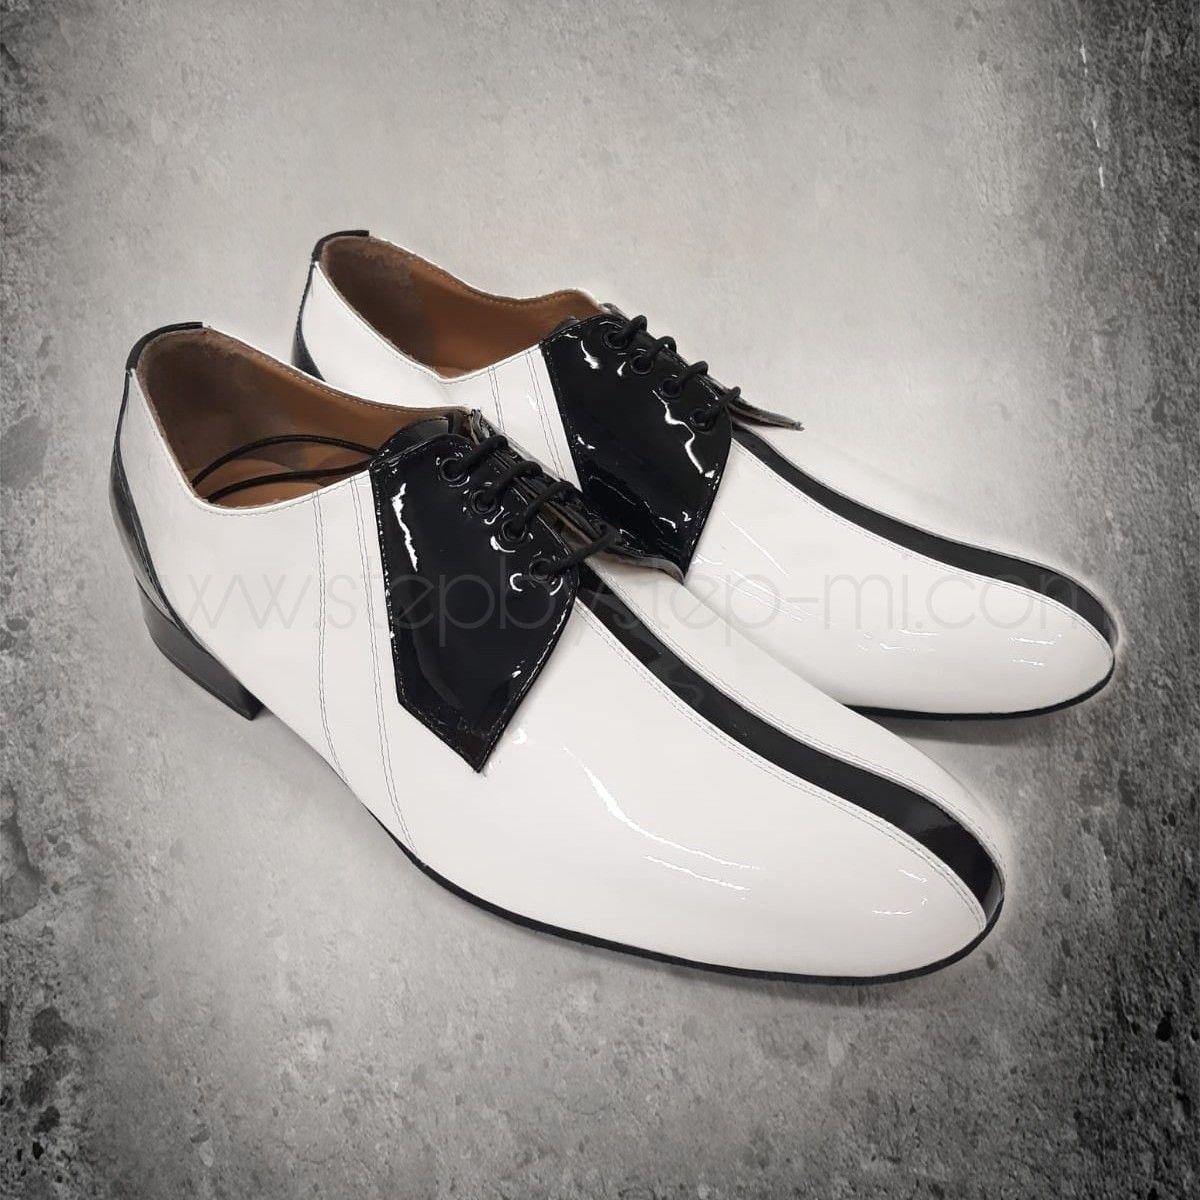 Scarpa uomo in vernice bianca e nera,  suola in bufalo ,tacco 20 stepbystep-mi.com   #stepbystep #ballo #tango #salsaon2 #scarpedaballo #mocassini #manshoes #scarpedauomo #danceshoes #salsa #bachata #fashion #shopping #shoppingonline #glamour #bachatasensual #shoe #style #instagood  #personalized #instashoes #instaheels  #stepbystepshoes #strass #rhinestones #rhinestoneshoes